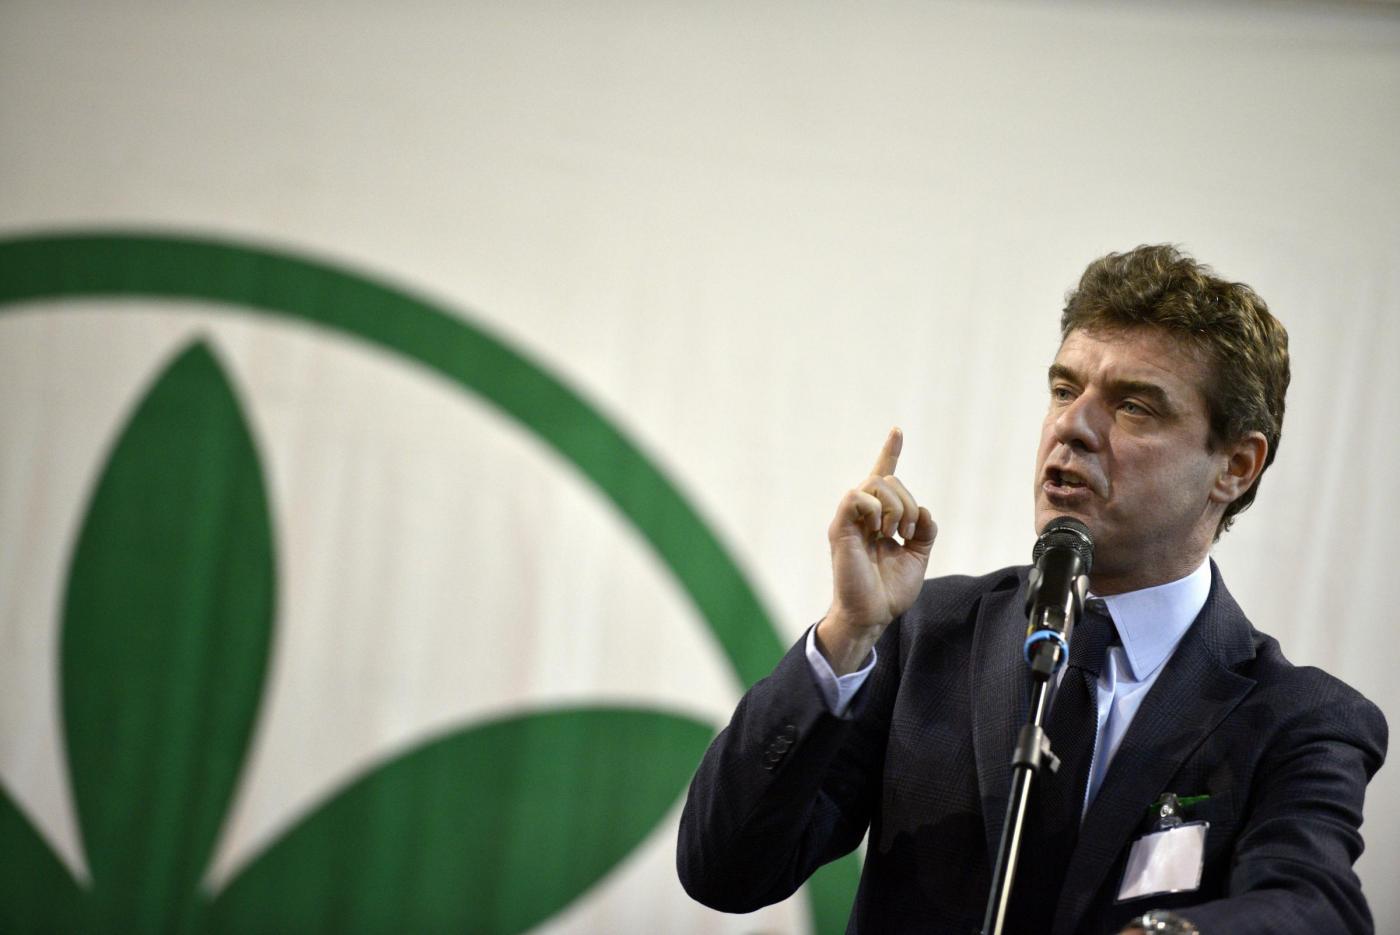 Rimborsopoli Piemonte: Roberto Cota rischia 2 anni per delle mutande verdi